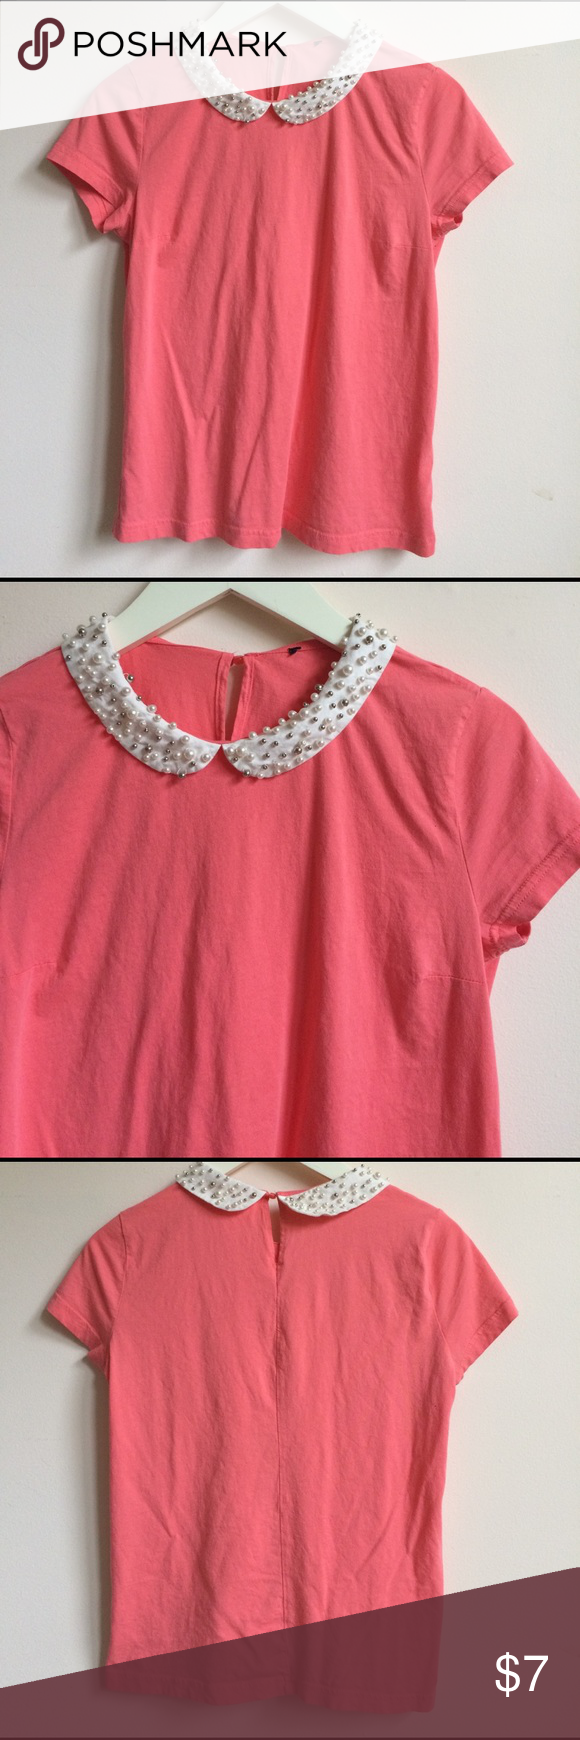 "Collard Shirt Beaded collard shirt with darts. length: 22"" NOT ANTHRO BRAND similar item Anthropologie Tops"